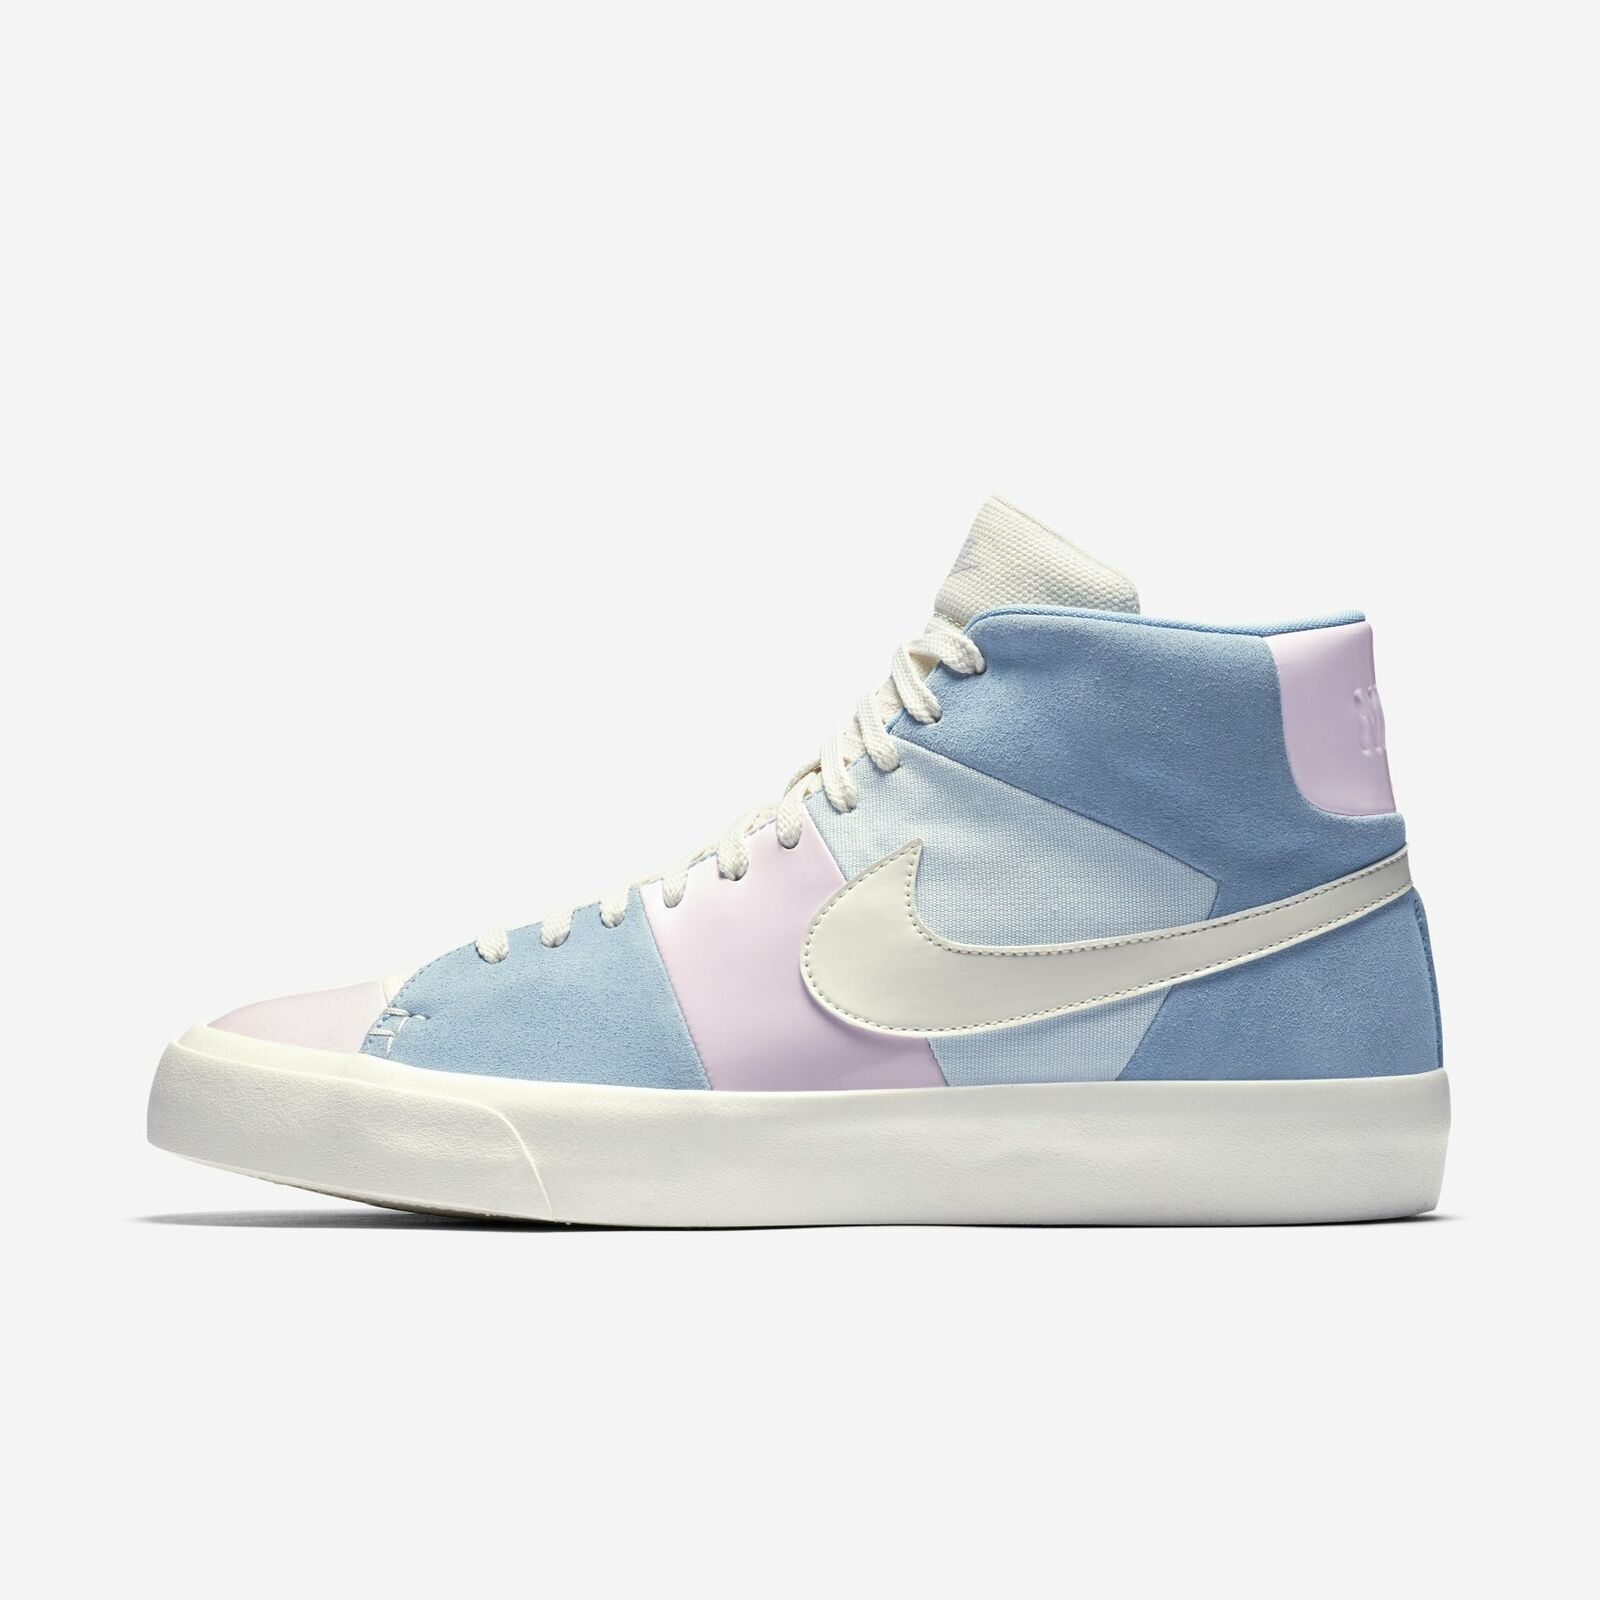 Men's Nike Blazer Royal Easter QS shoes Pink bluee Sail Size 11 AO2368 600 NIB